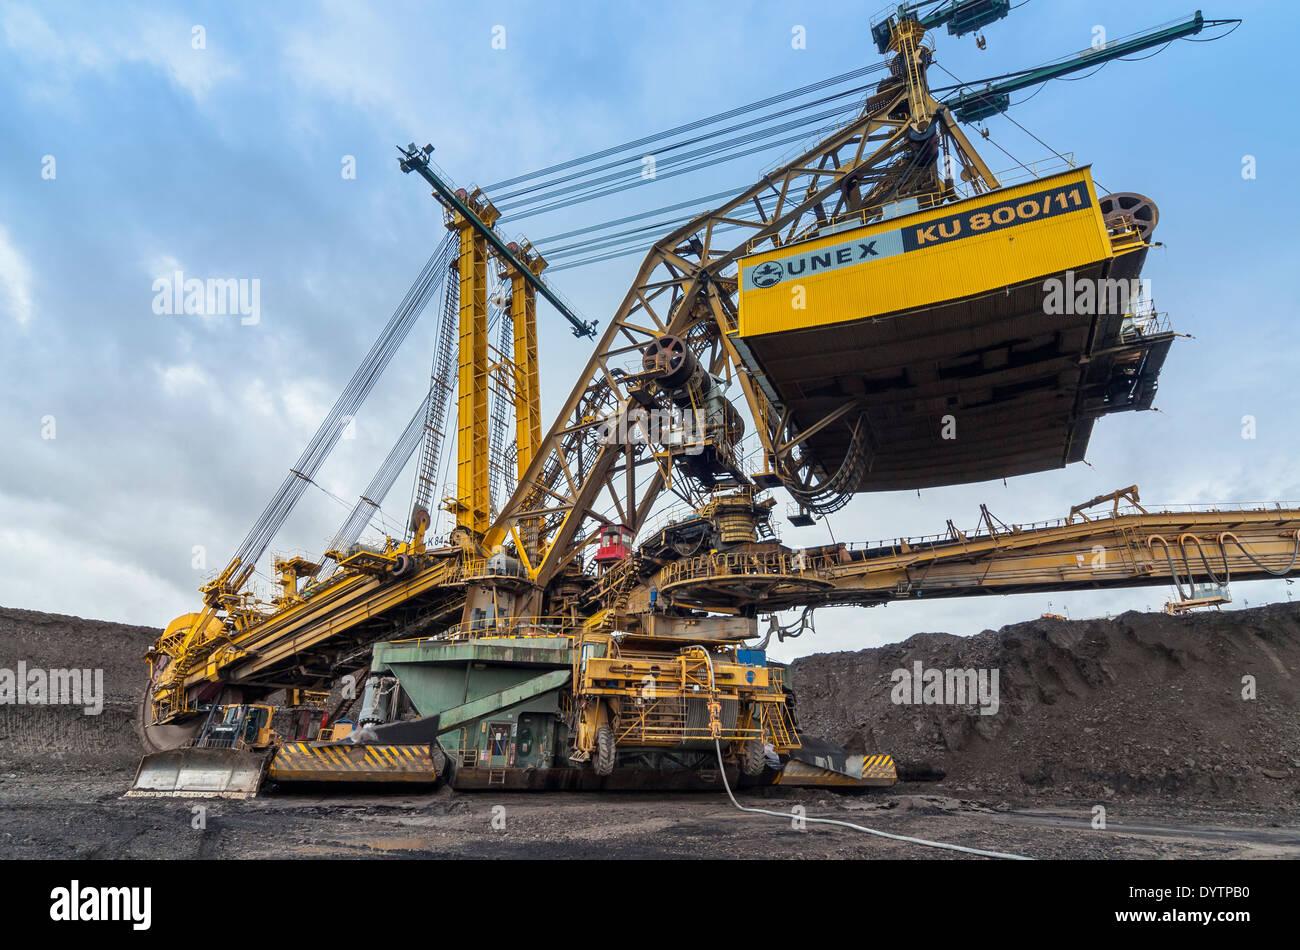 Colossal Bucket-wheel Excavator (BWE) KU 800 Digging Overburden at Open-pit Lignite Coal Mine, North Bohemia, Czech Stock Photo